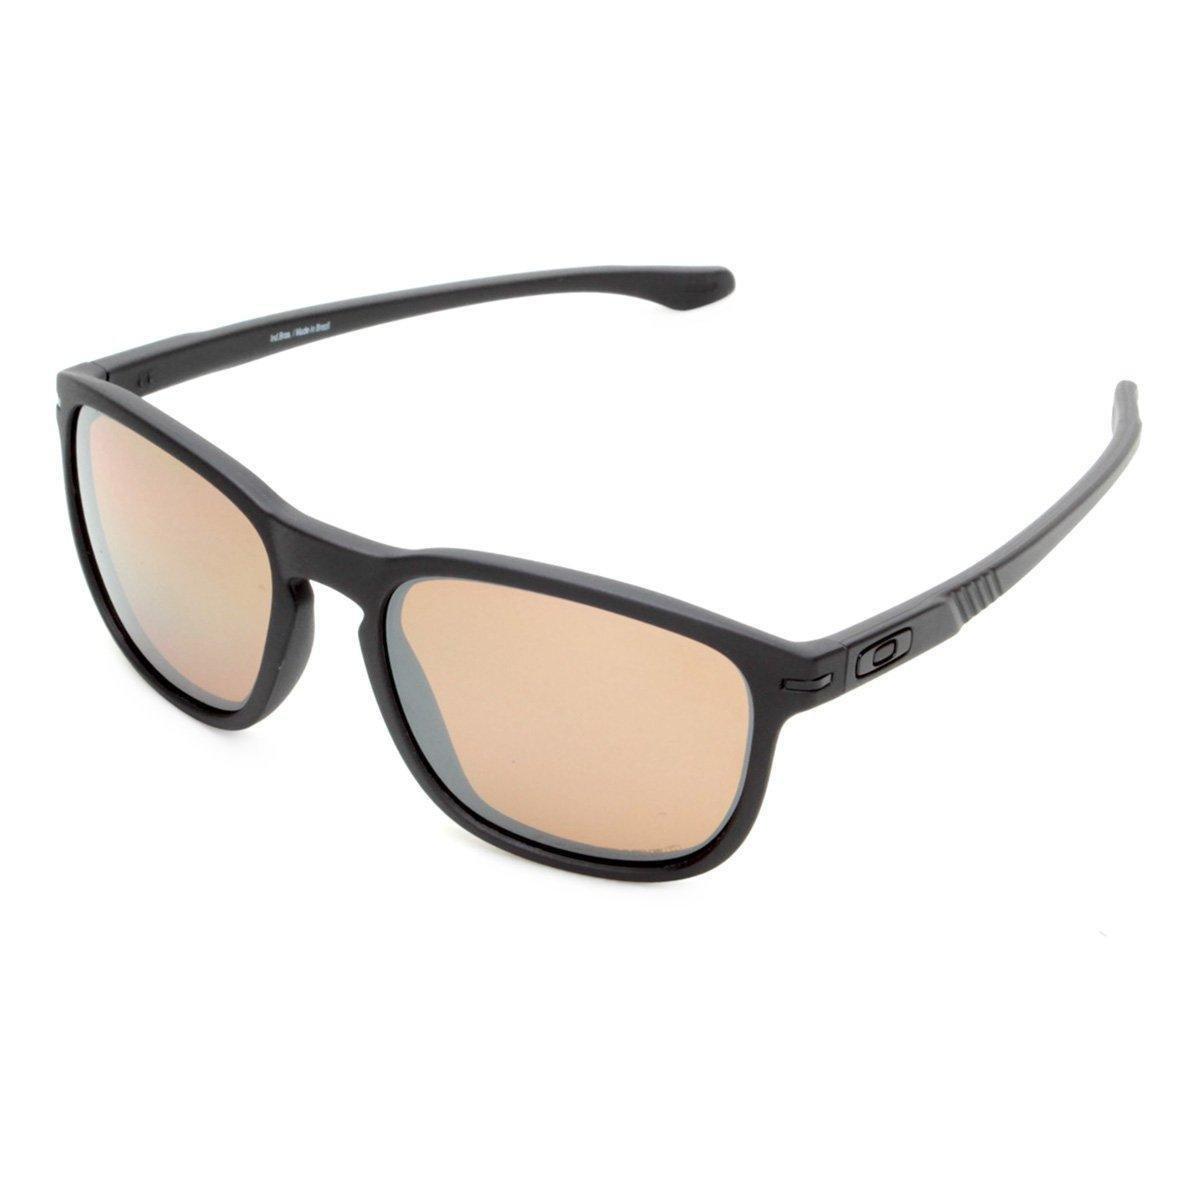 264a17532c484  Zattini  Óculos Oakley enduro polarizado R 203,99